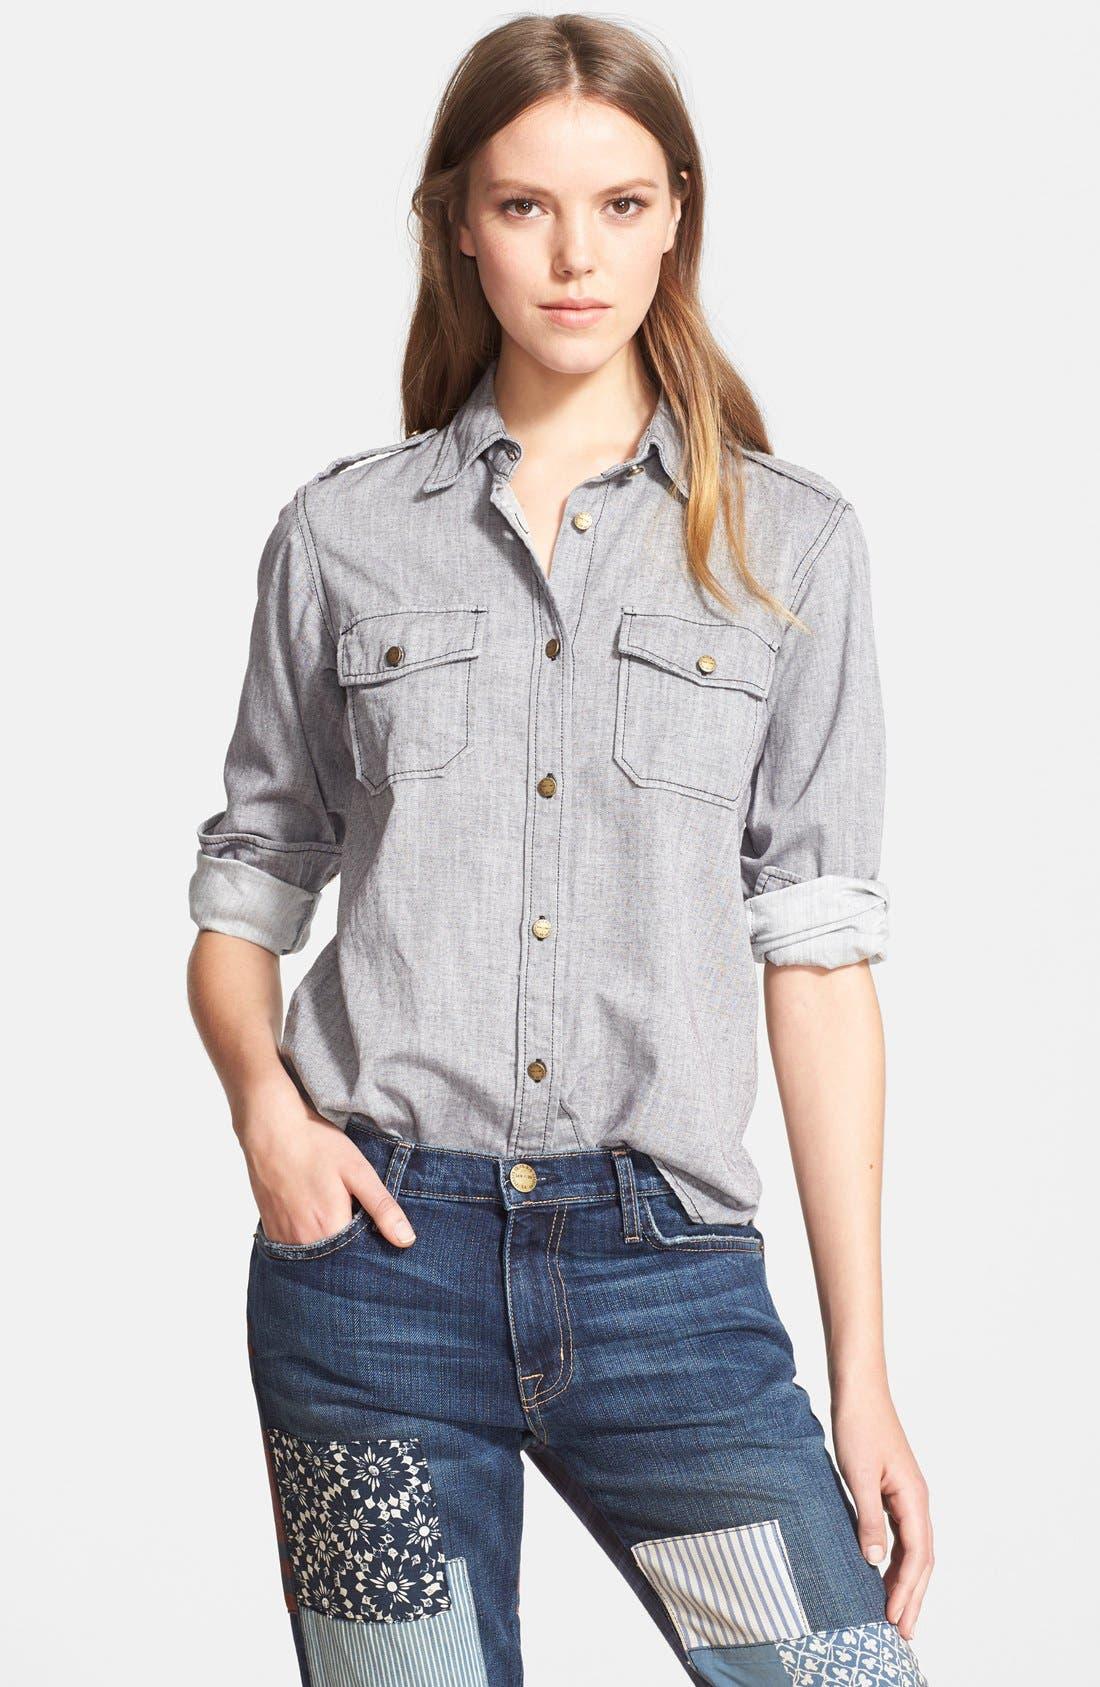 Main Image - Current/Elliott 'The Perfect Shirt' Cotton Shirt